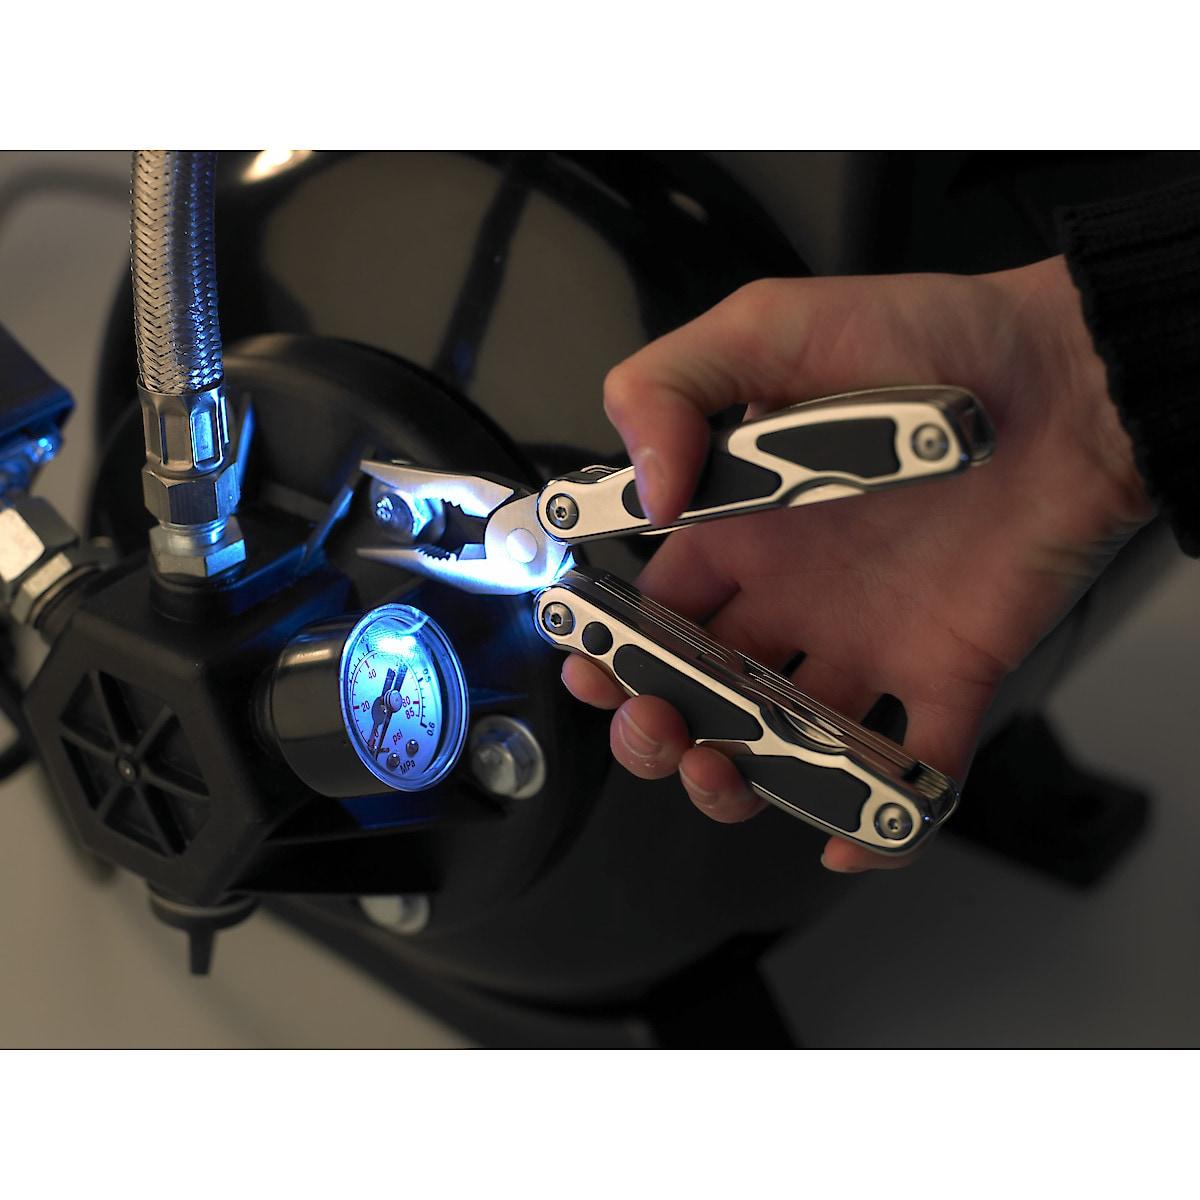 Asaklitt Multi-Tool